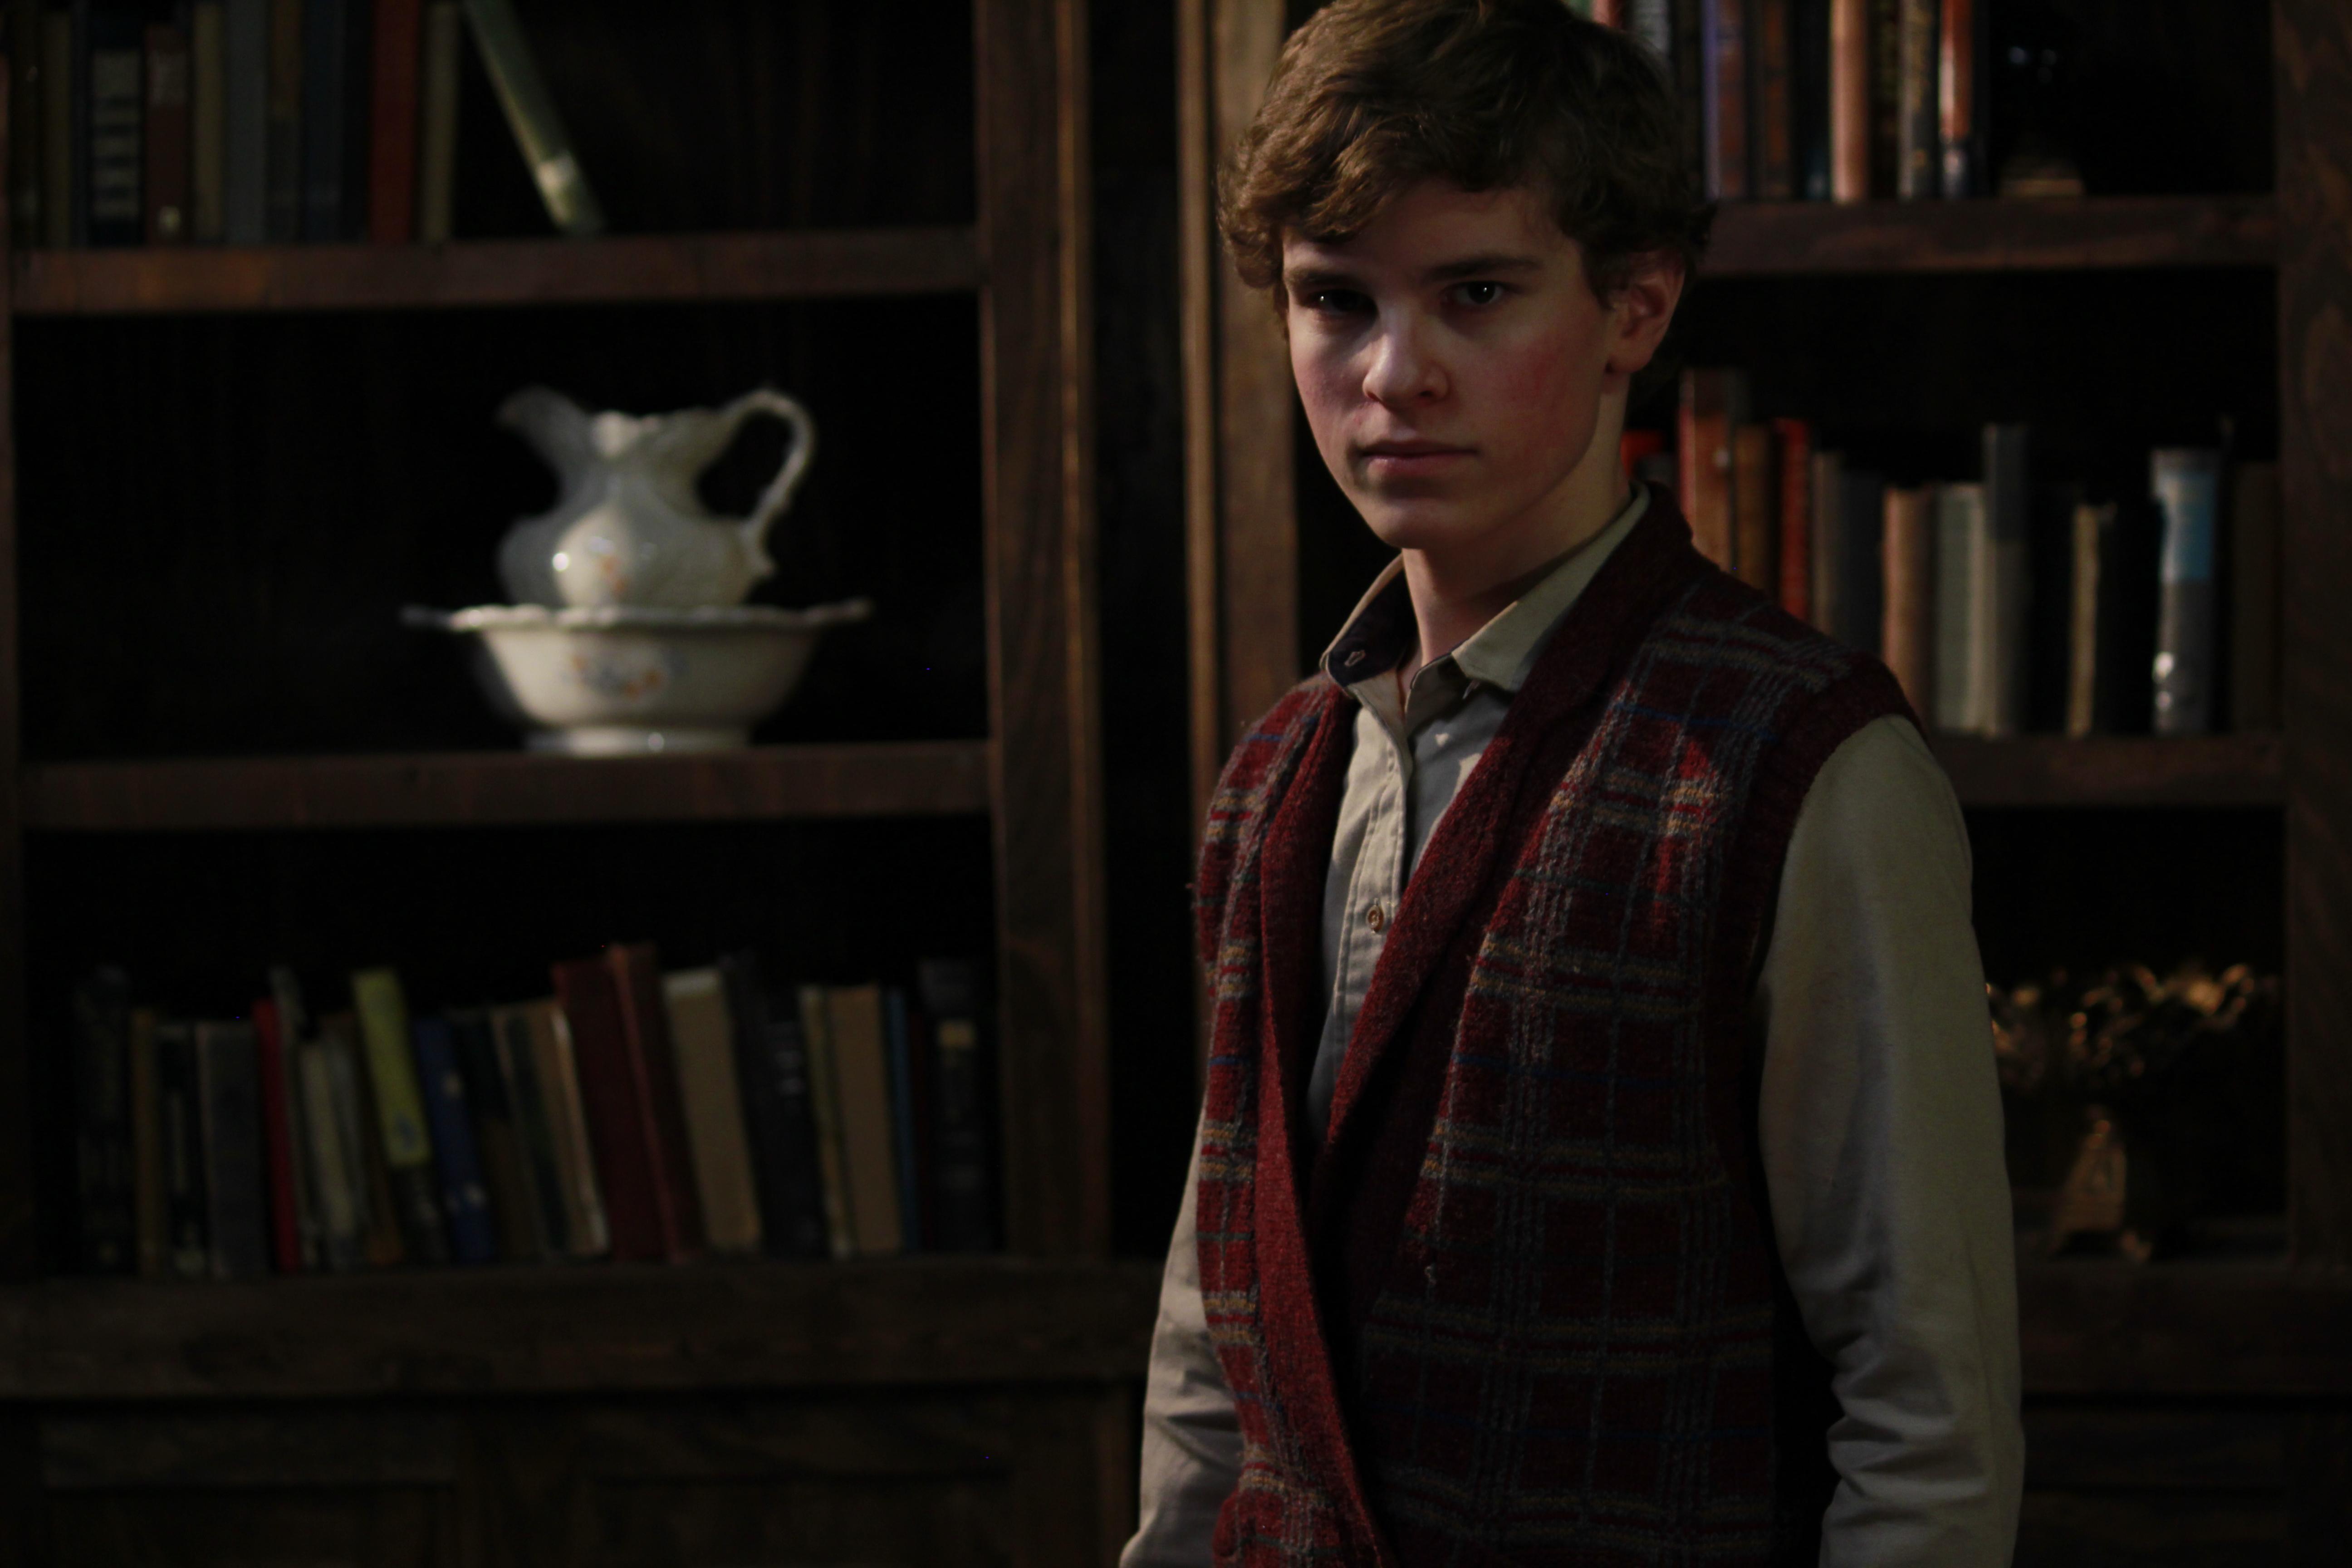 Narnia LWW Edmund Pevensie Wartime Outfit vs2